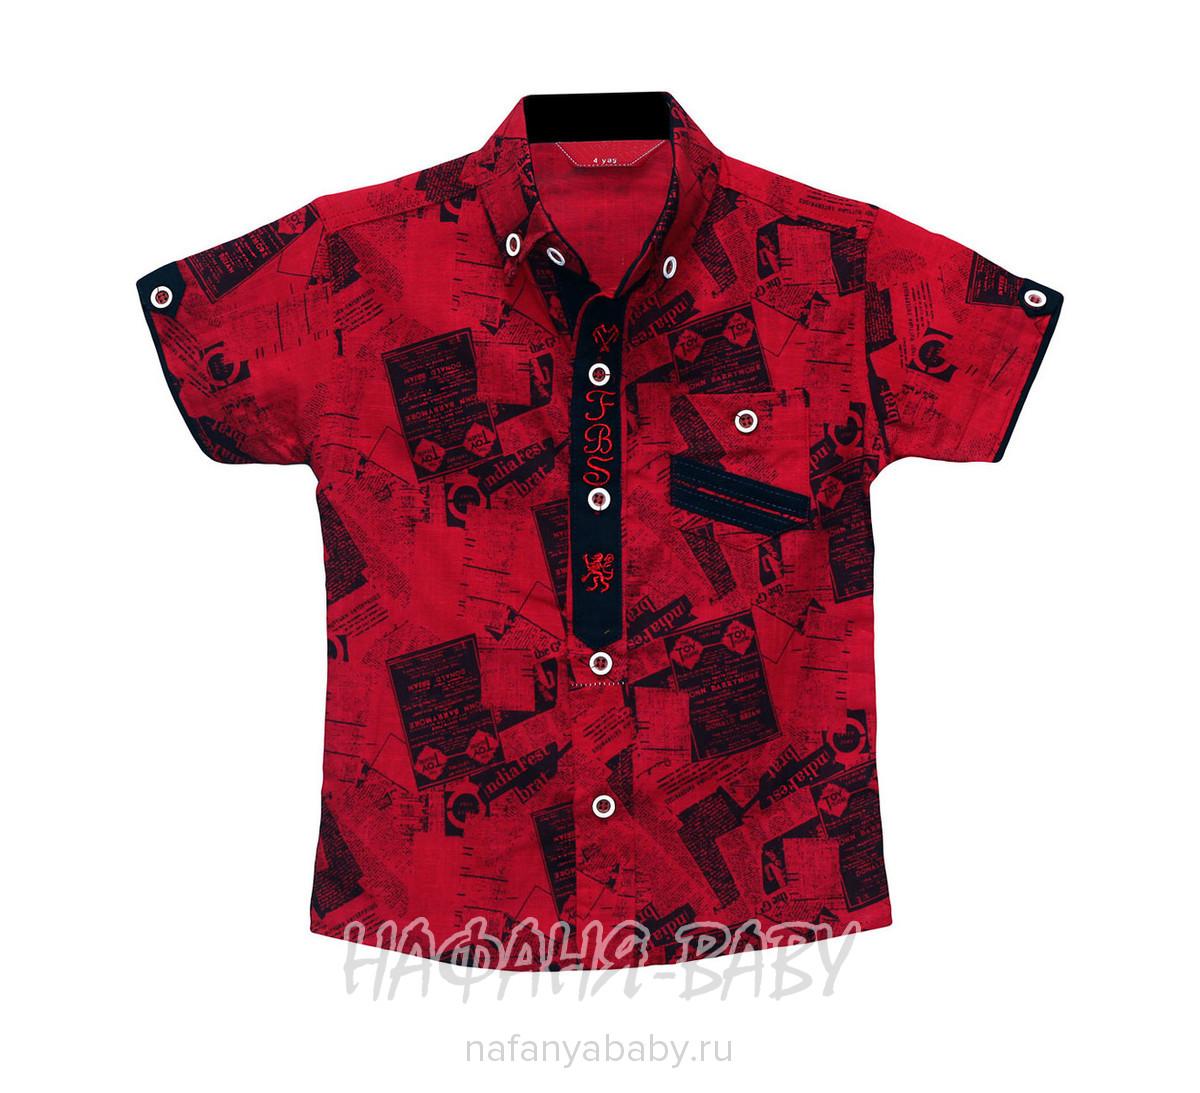 Детская рубашка FABISA арт: 112 1-4, 1-4 года, оптом Турция